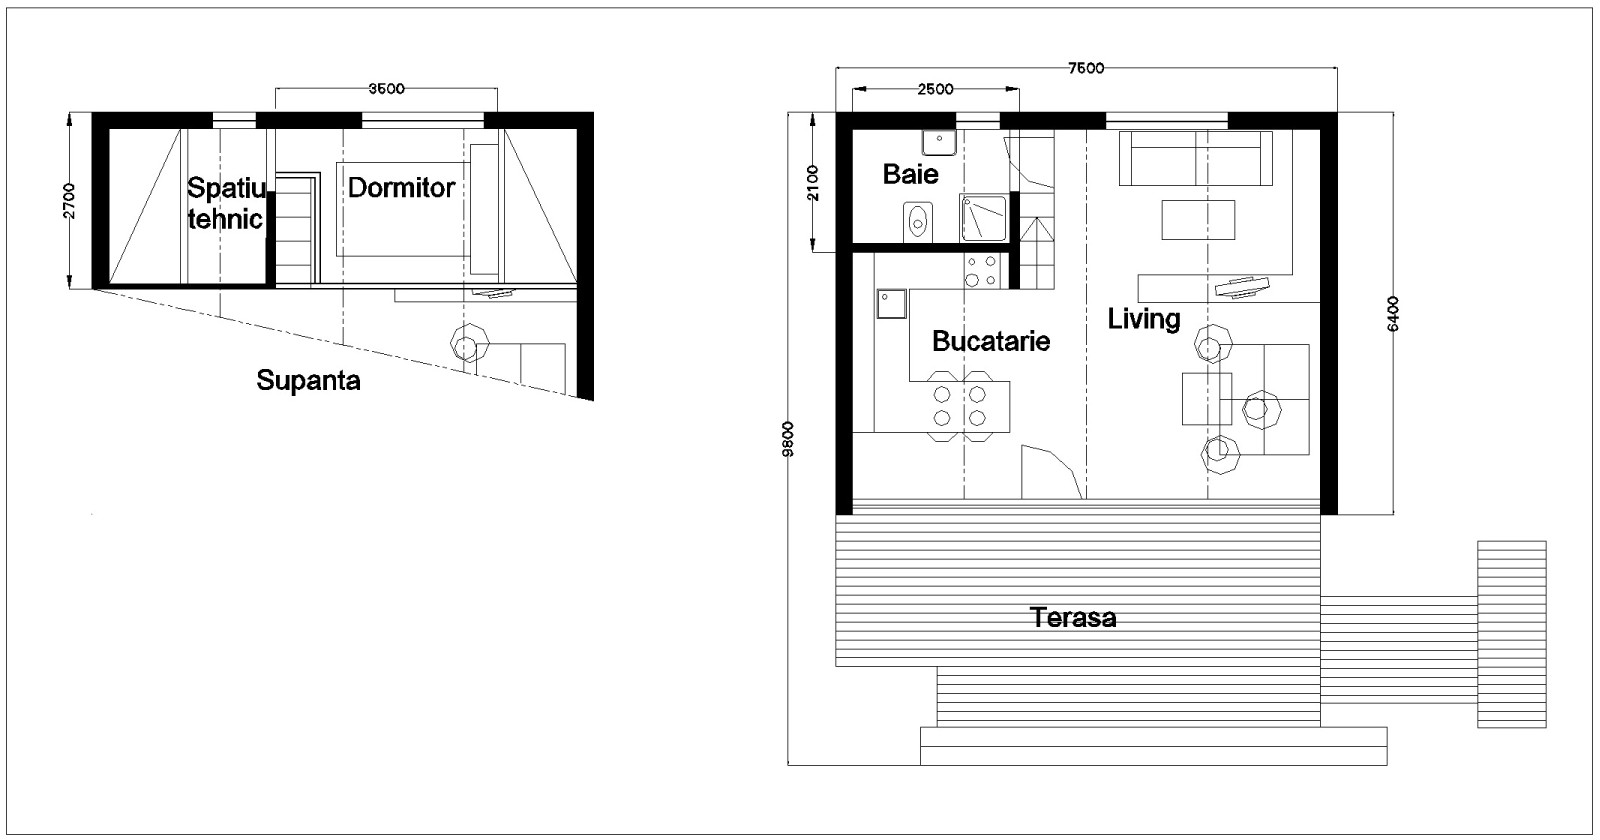 Zero Energy Home Design Floor Plans home floor plan 864 sqft 2 bedroom 1 bathroom Soleta Zeroenergy Floorplans Via Smallhouseblissw960 Tree House Plan Eco Perch 1 Interior